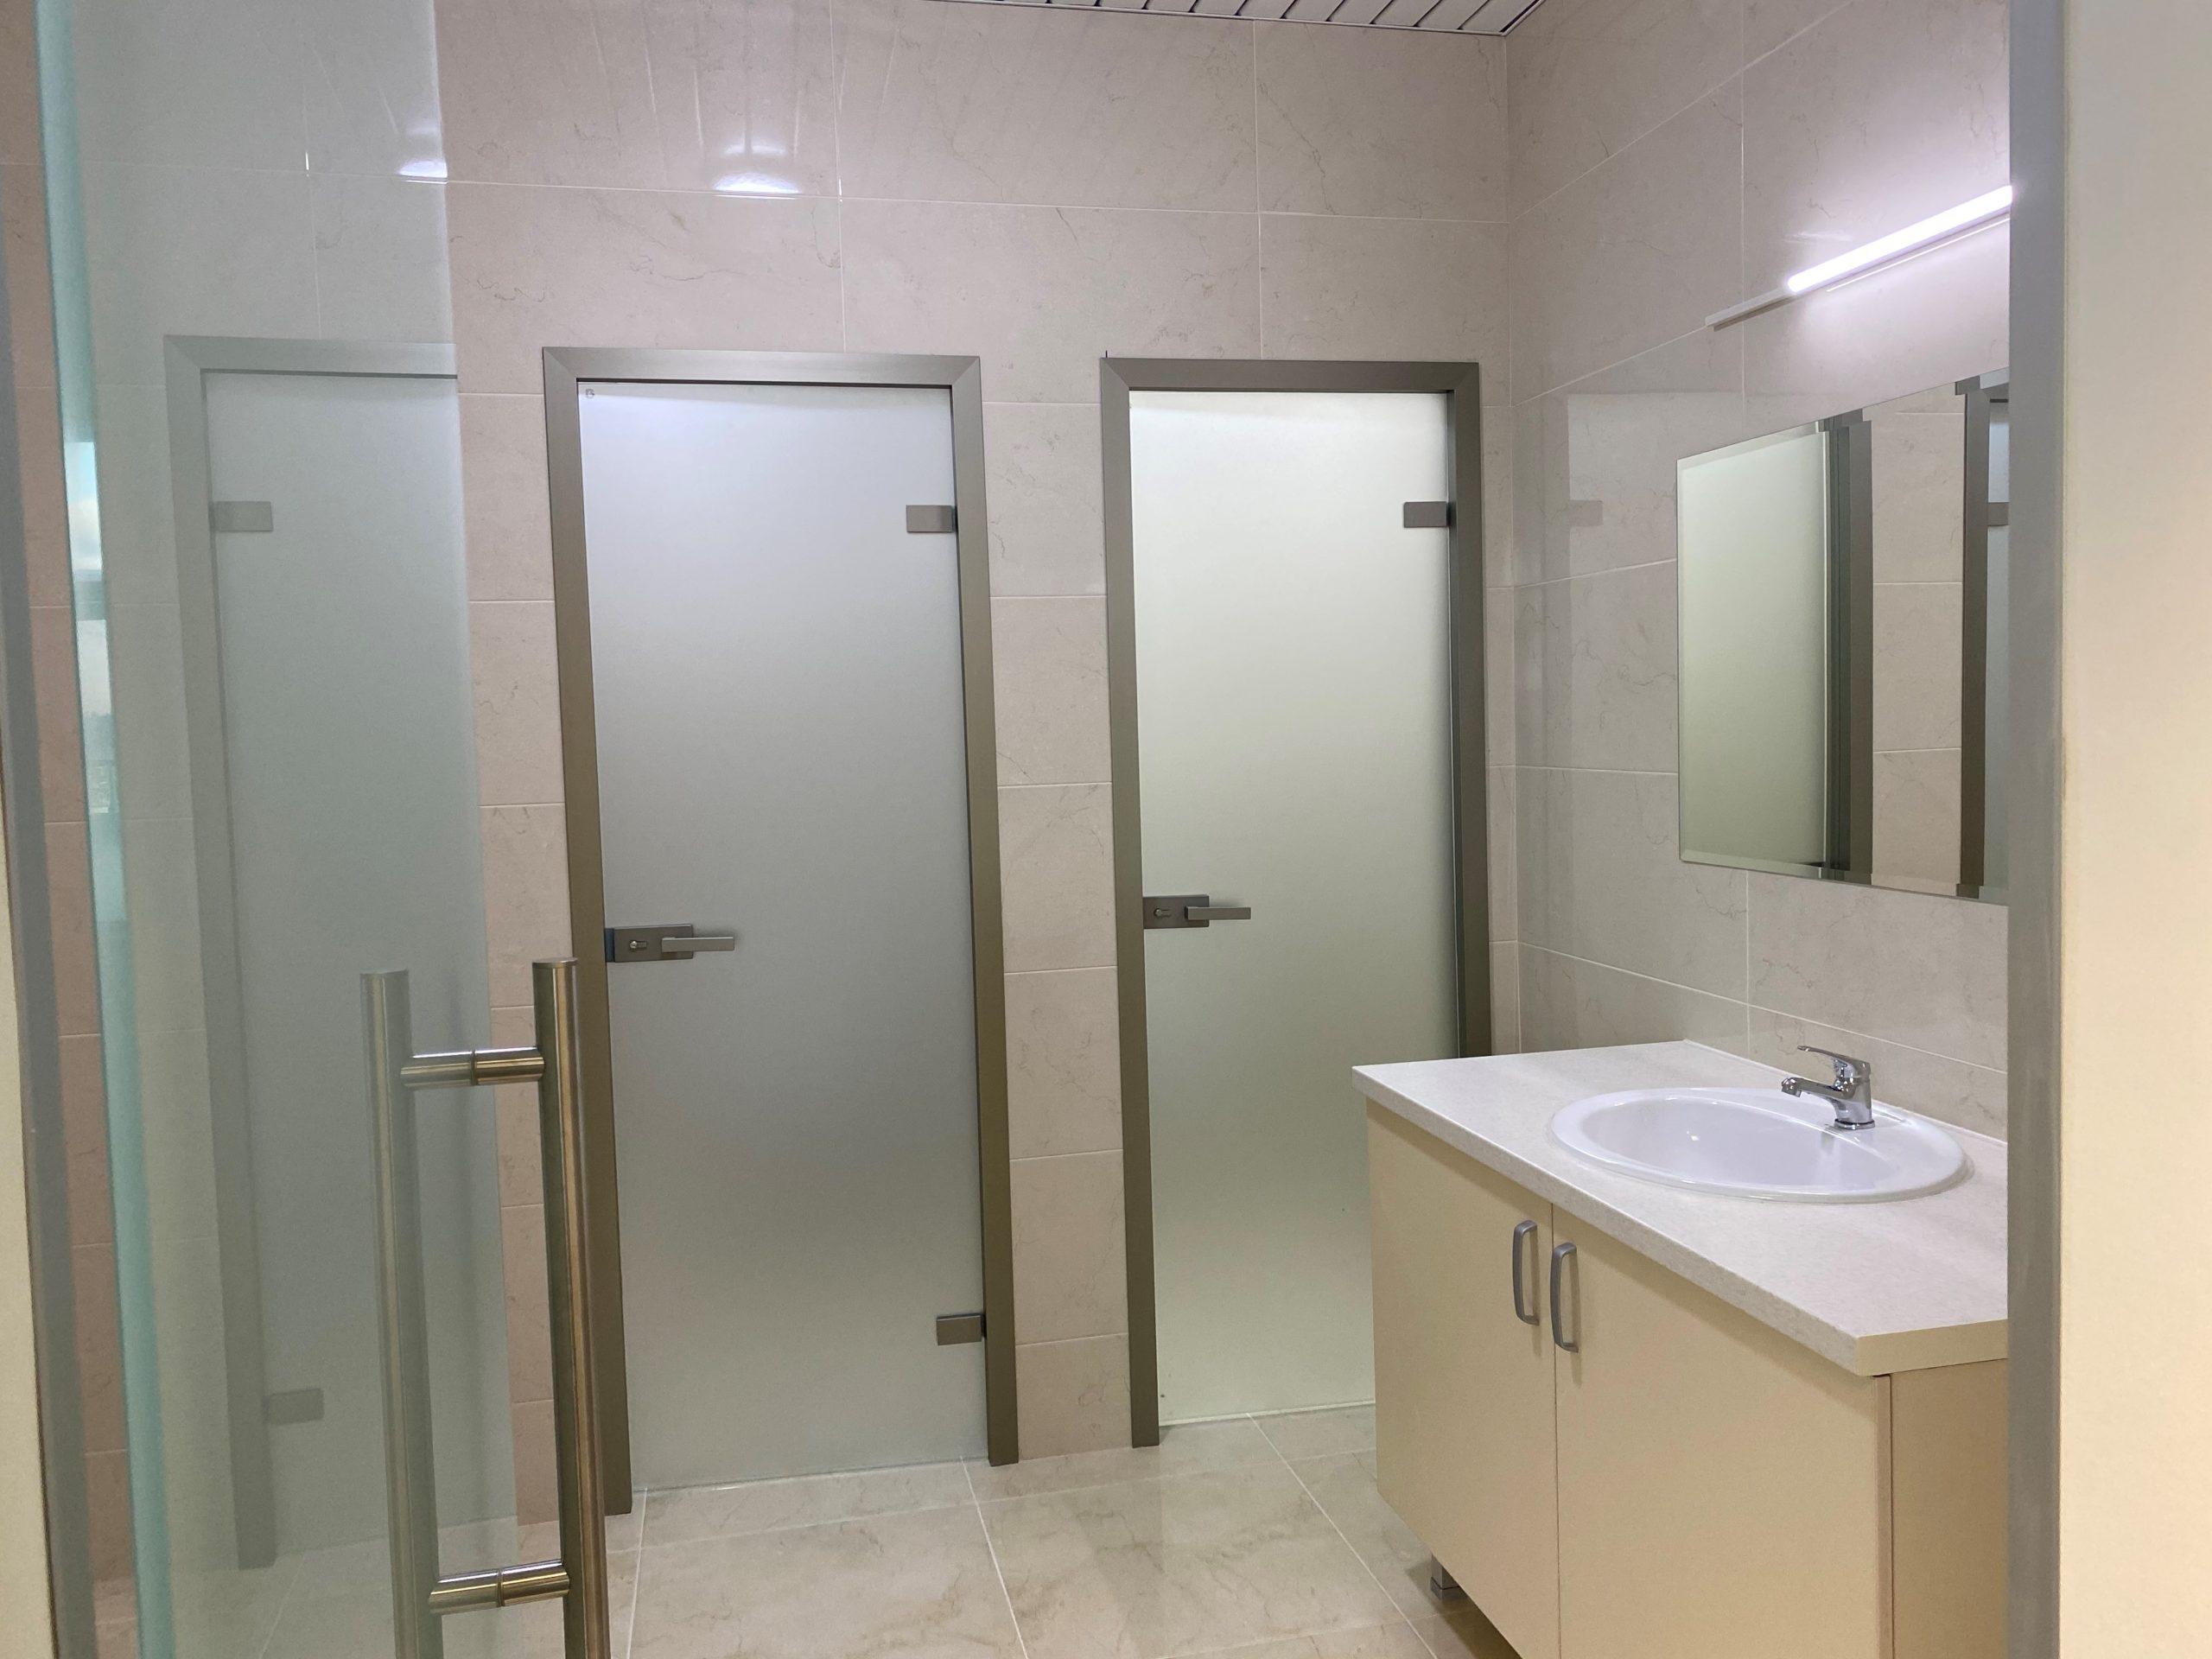 izvedba-na-toaleti